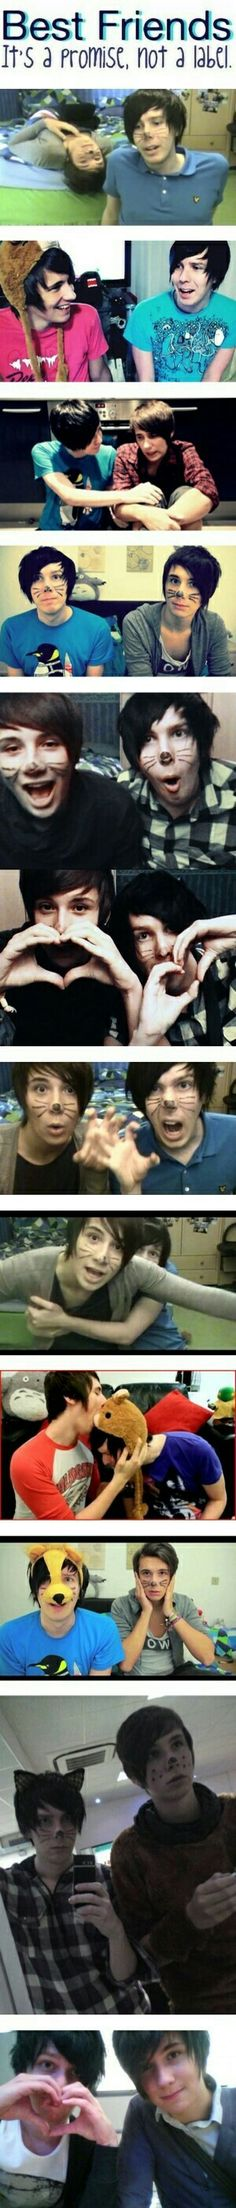 Best friends: Its a promise, not a label, Dan, Phil, text, timeline; Dan and Phil